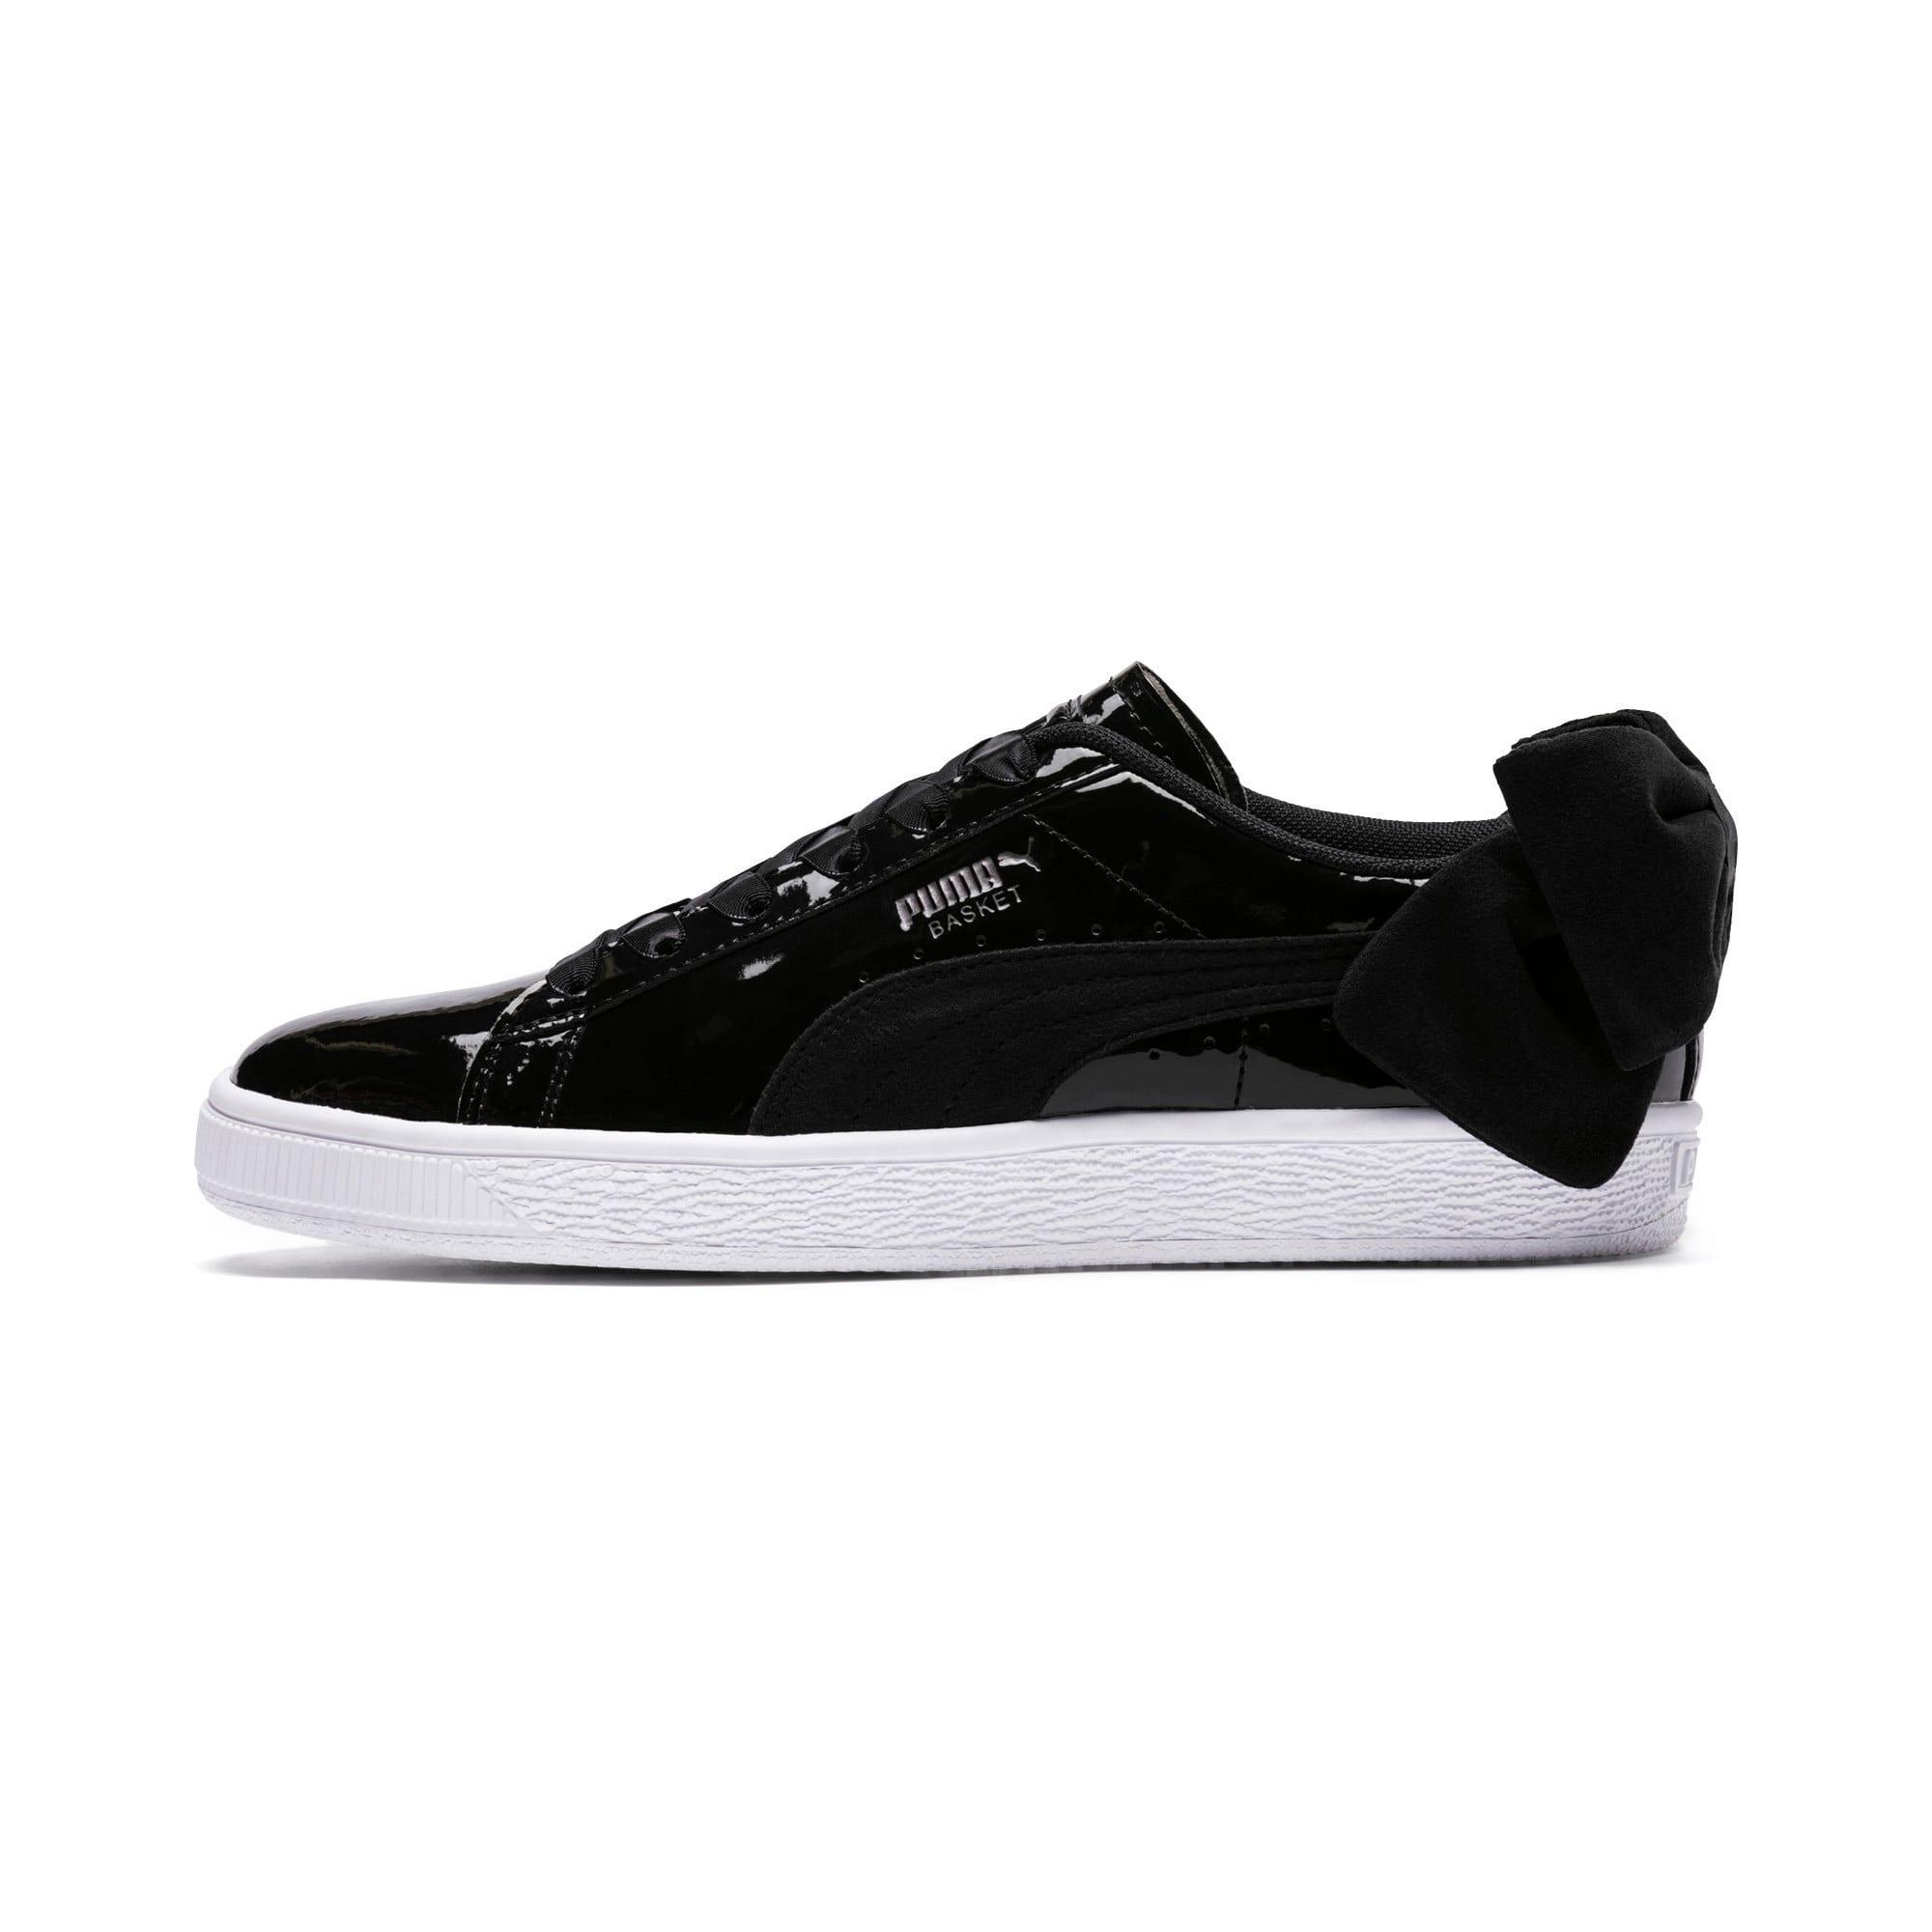 Thumbnail 1 of Basket Suede Bow Women's Sneakers, Puma Black-Puma Black, medium